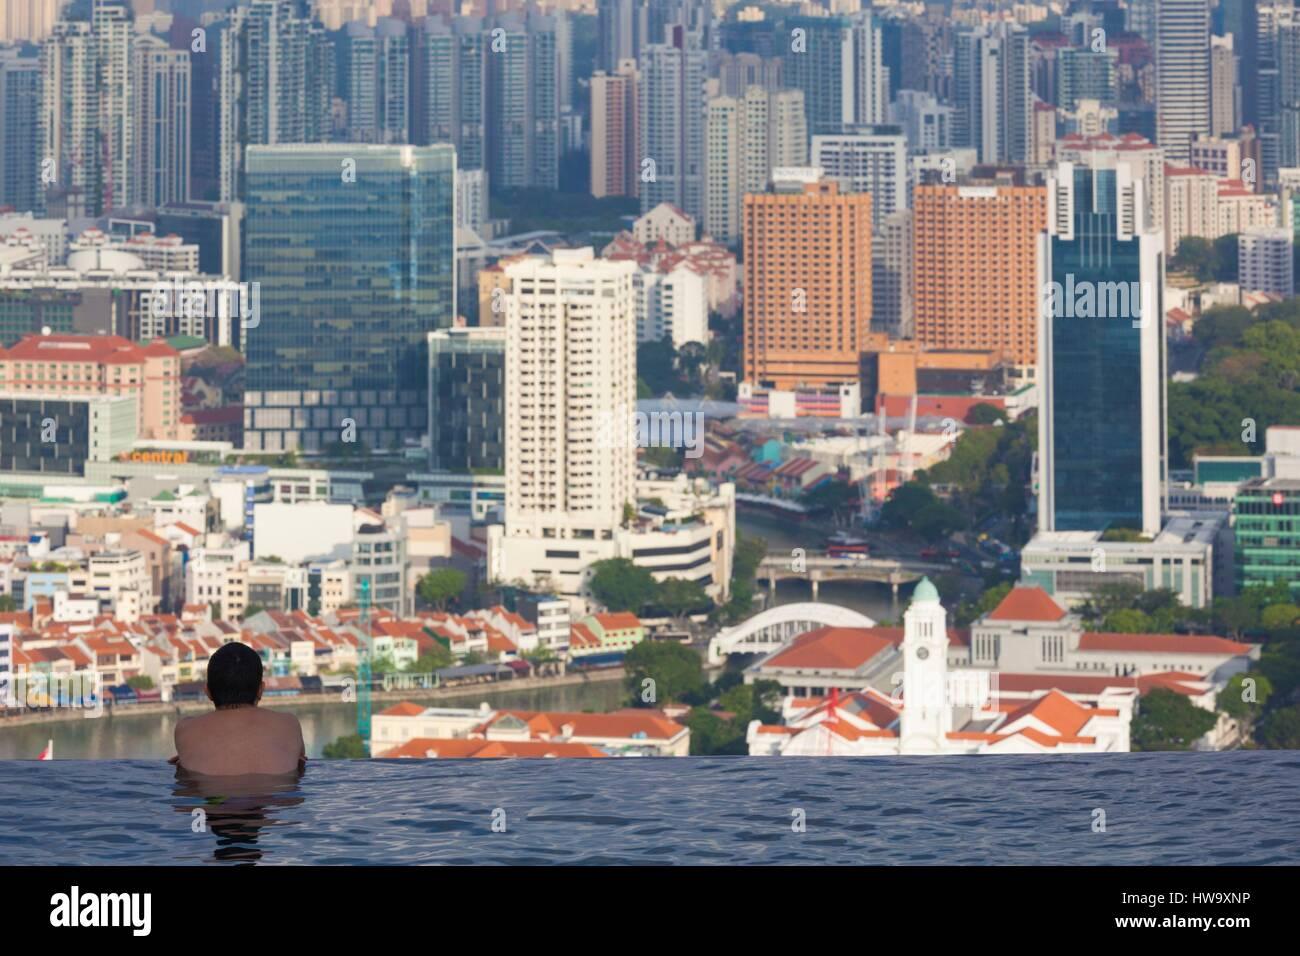 Singapore, Marina Bay Sands Hotel, rooftop swimming pool, dawn - Stock Image